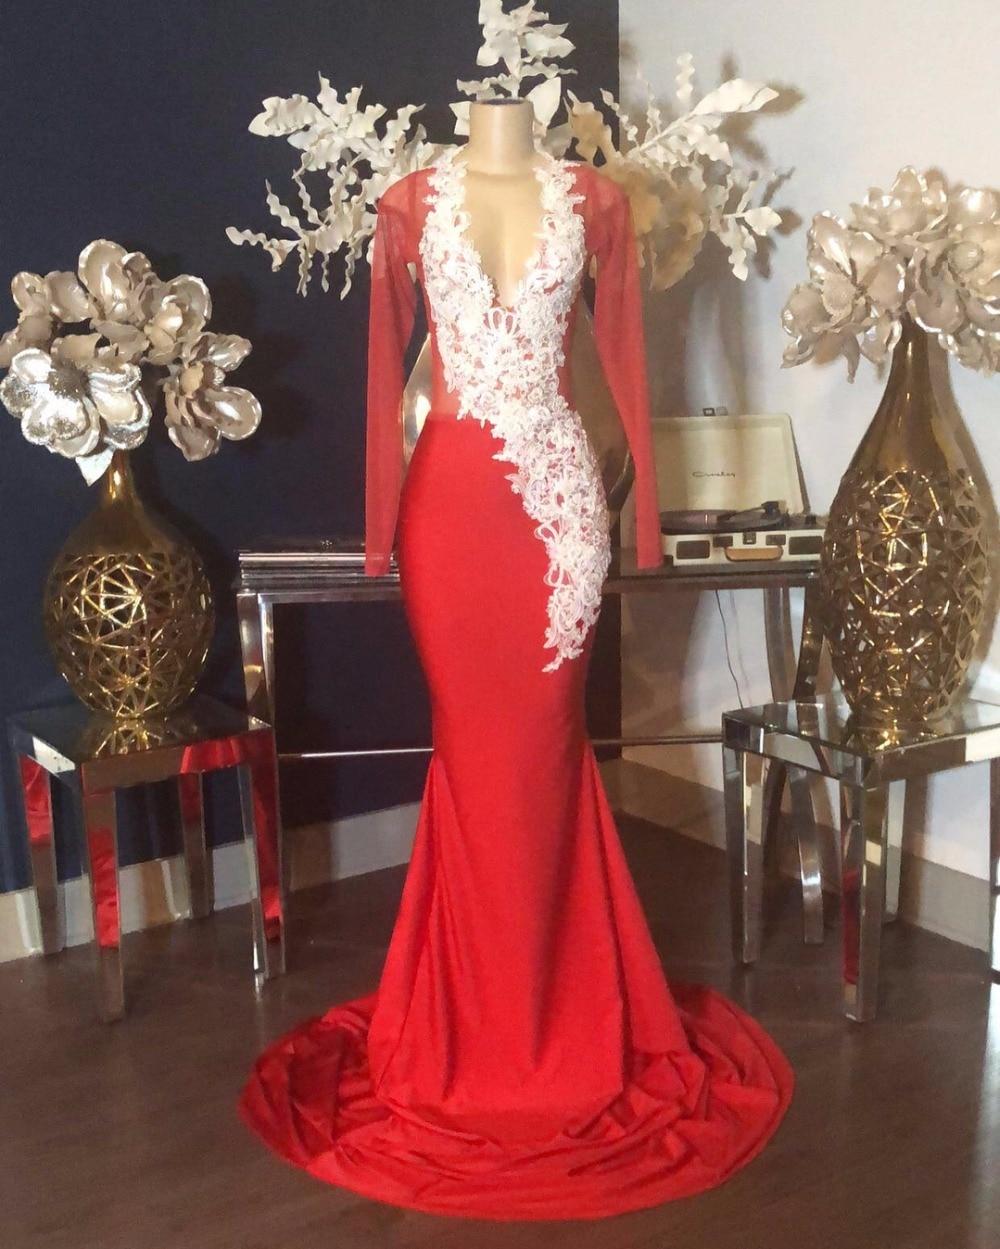 Red And White Lace Prom Dress: Elegant Red Mermaid Prom Dresses 2019 Deep V Neck White